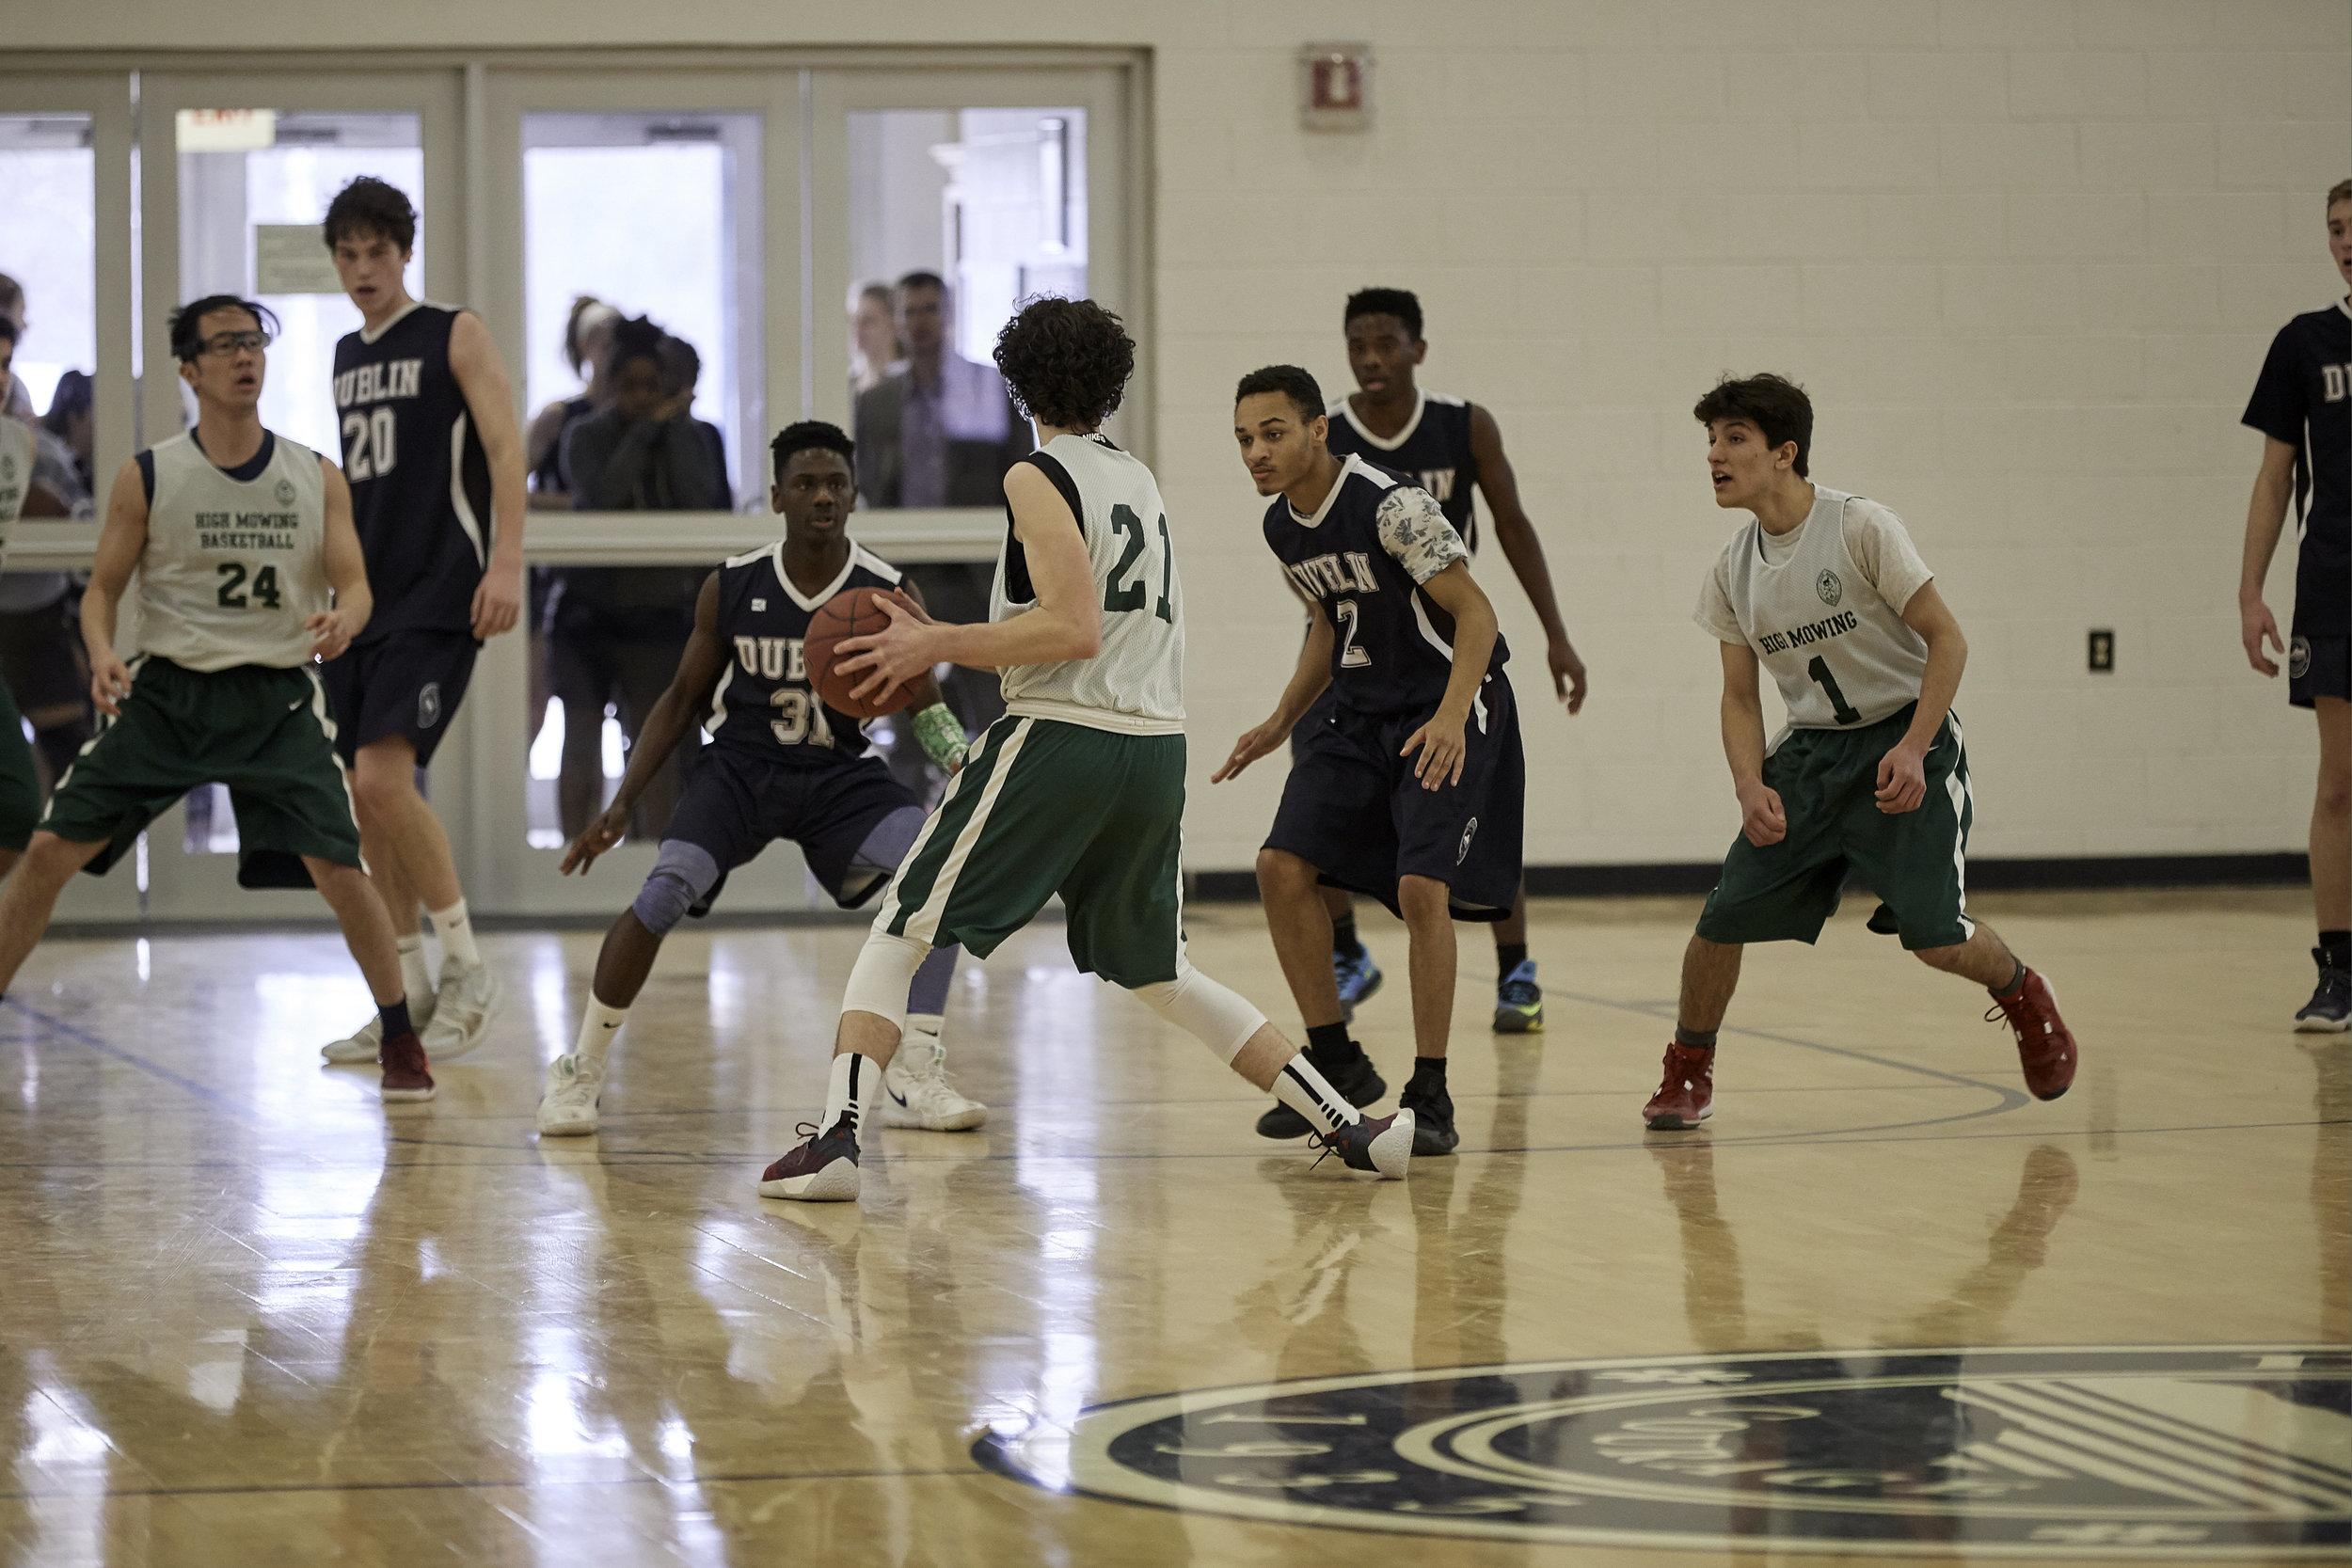 Boys Varsity Basketball vs High Mowing School - Feb 02 2019 - 0092.jpg